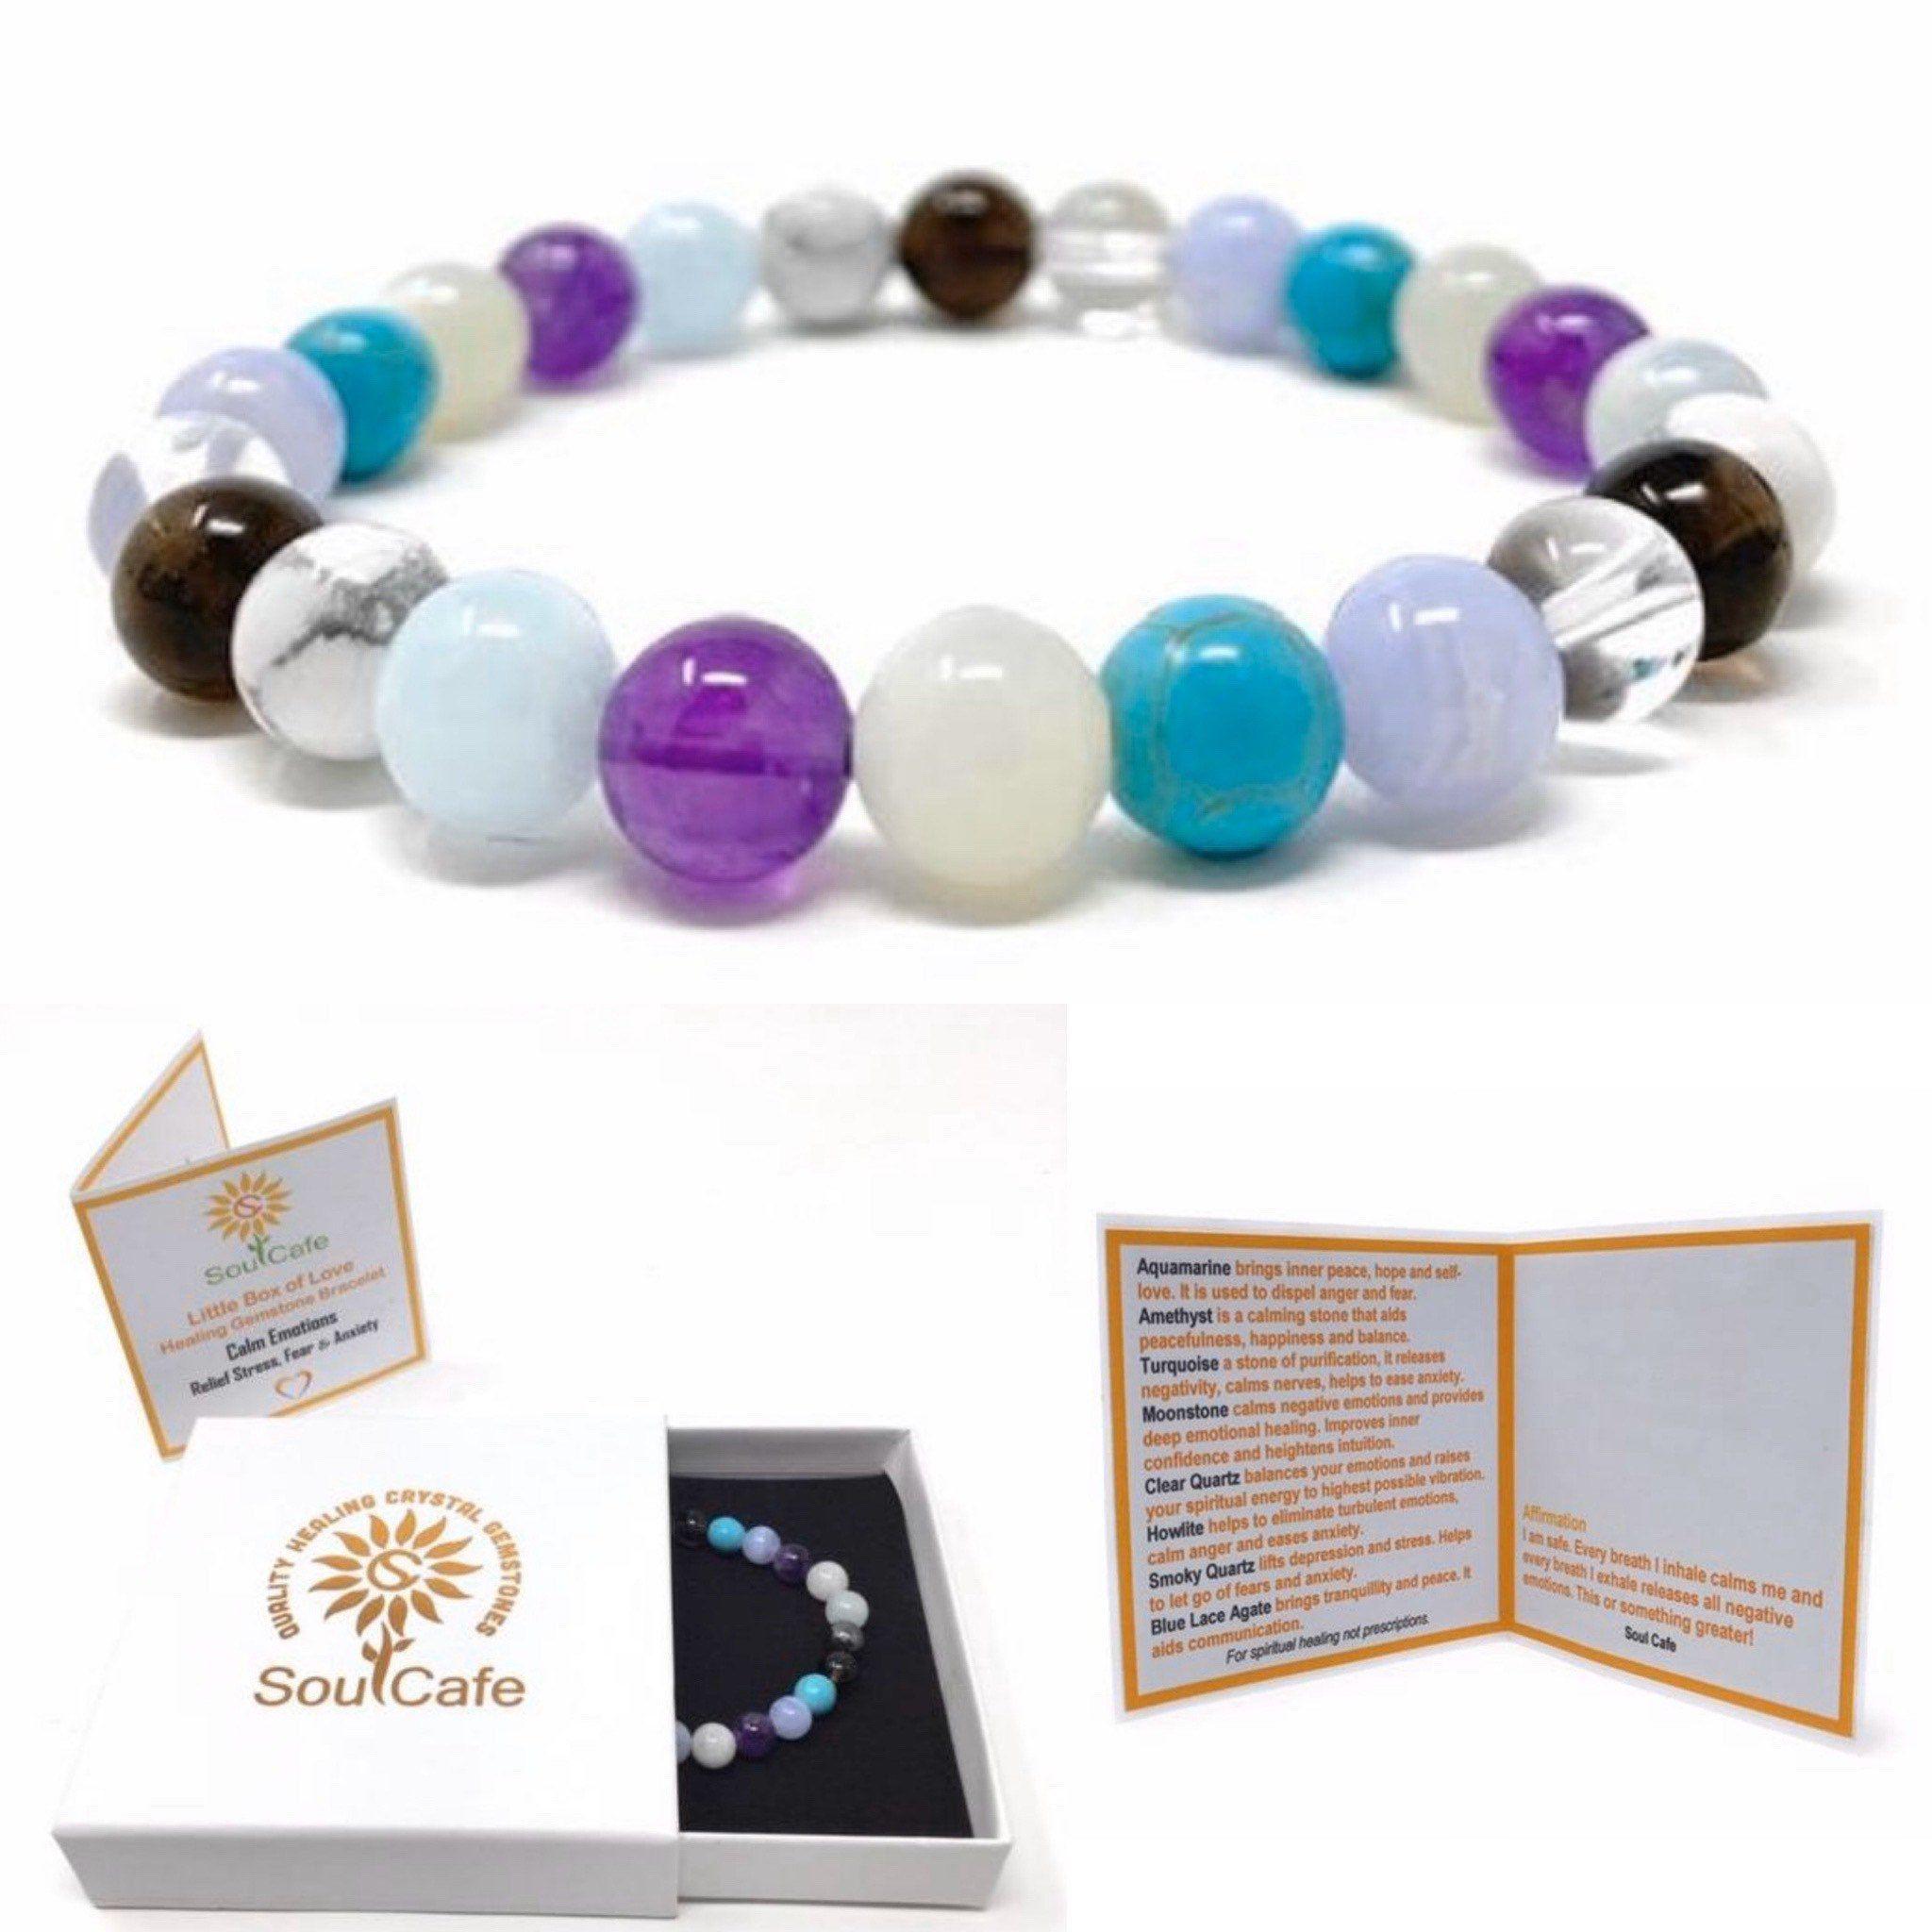 Calm Emotions Power Bead Bracelet Healing Crystal Gemstone Etsy In 2020 Beaded Bracelets Bracelet Gift Box Crystals And Gemstones